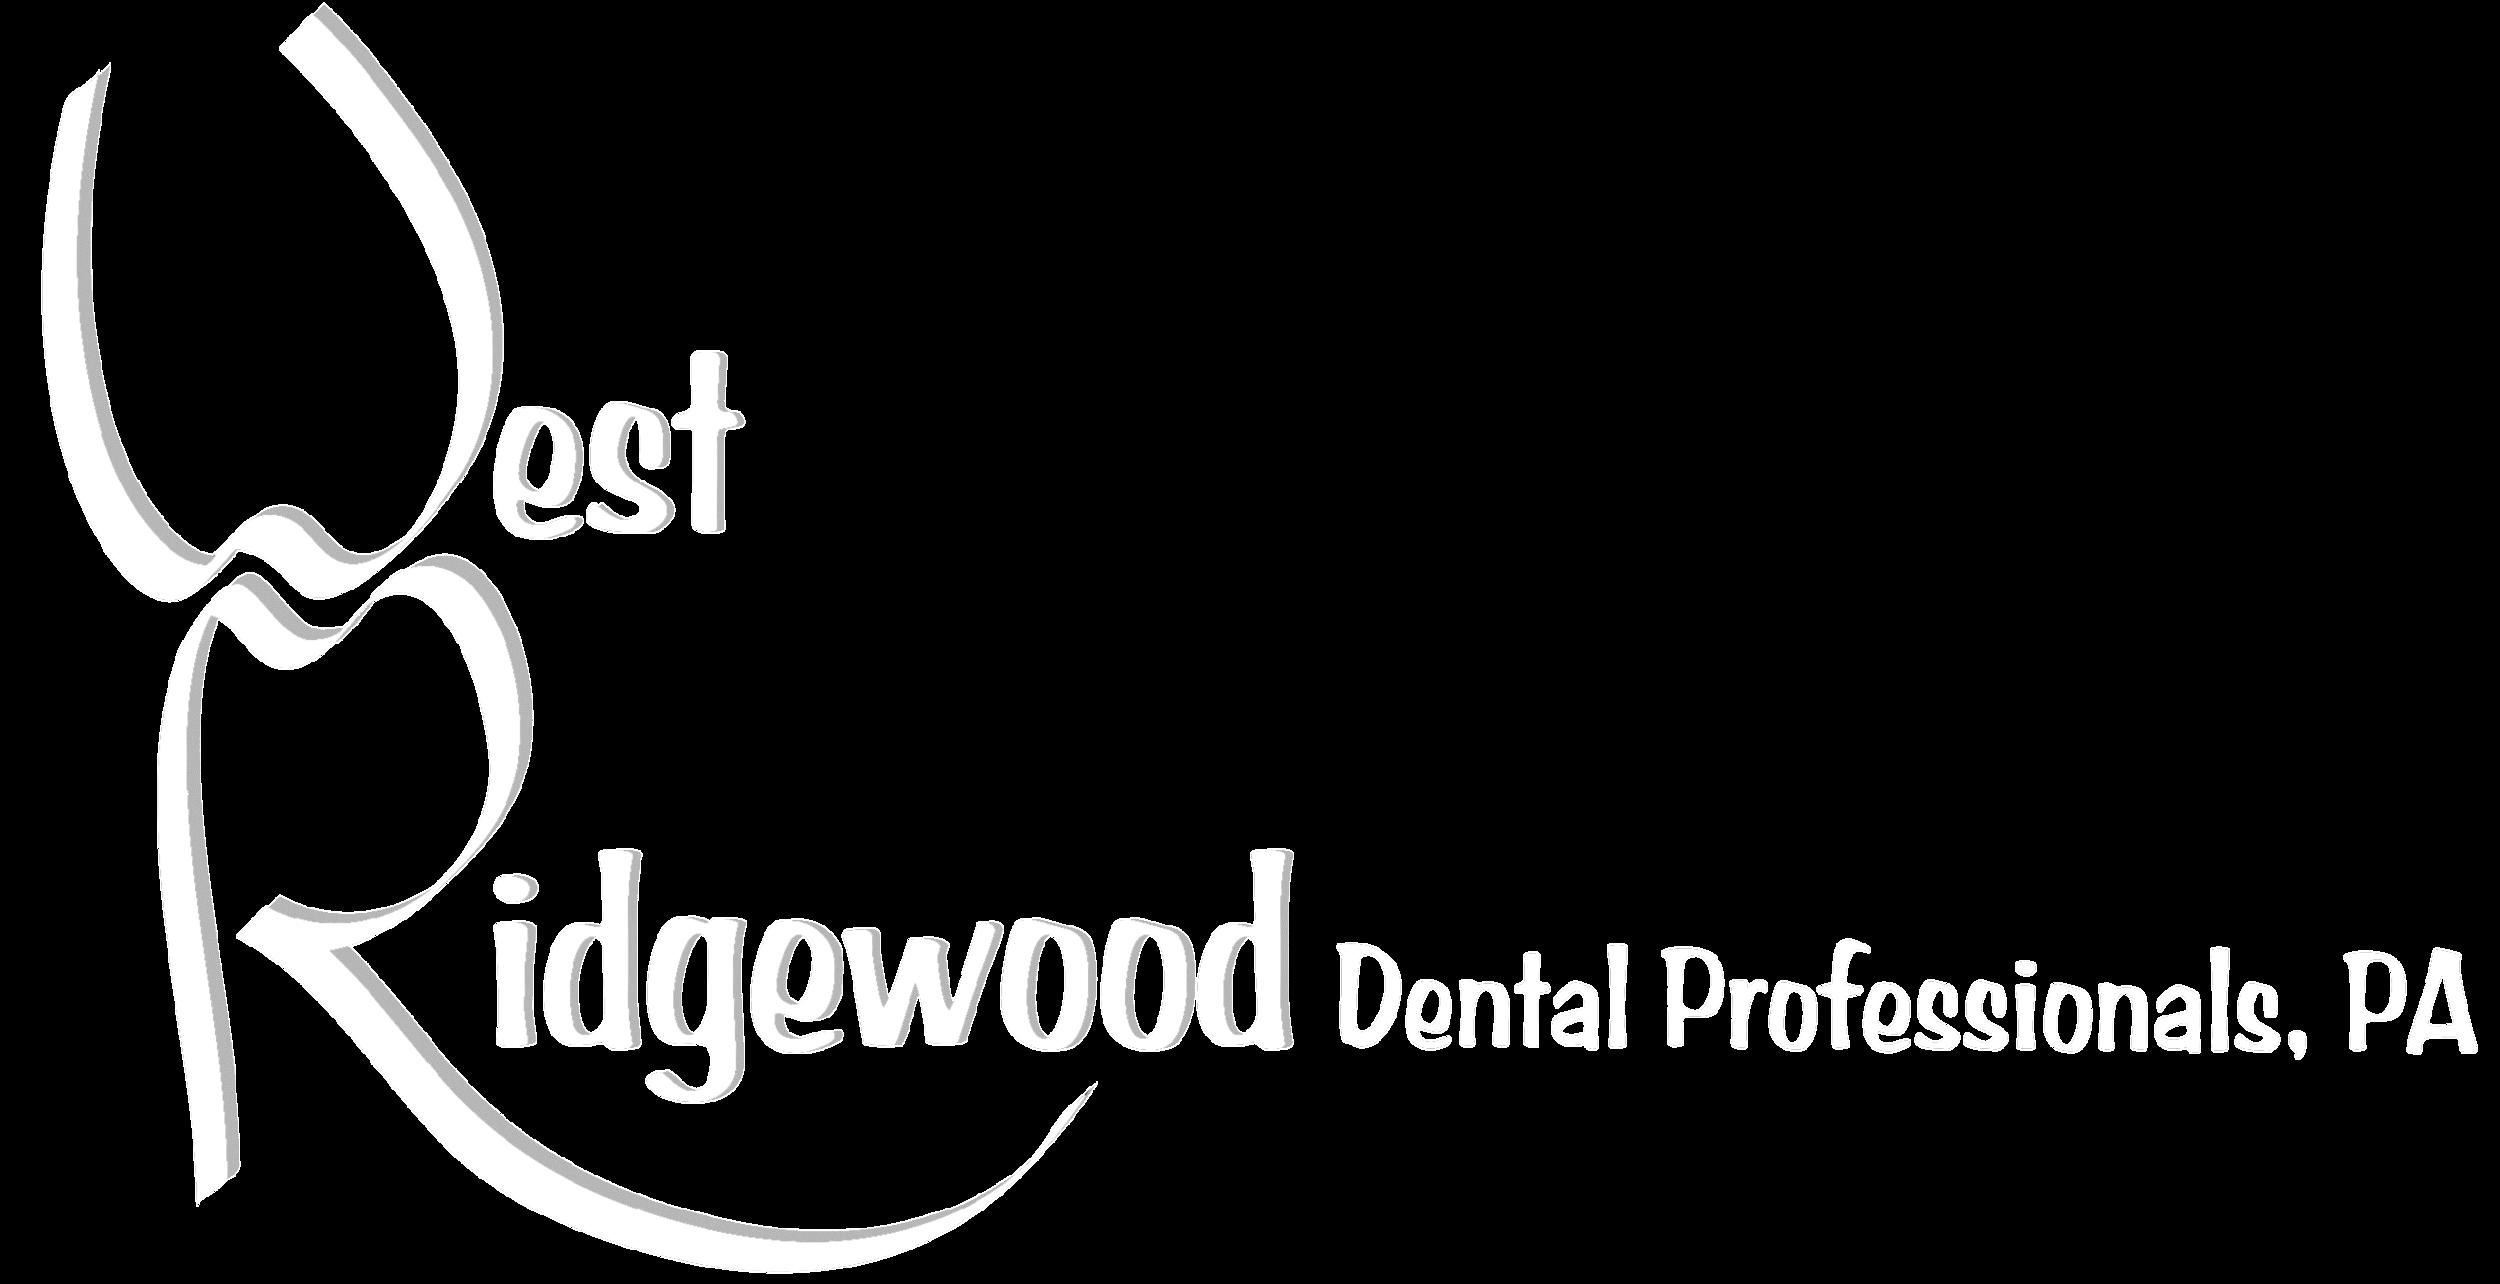 West Ridgewood Dental Professional, PA Logo Transparent White.png